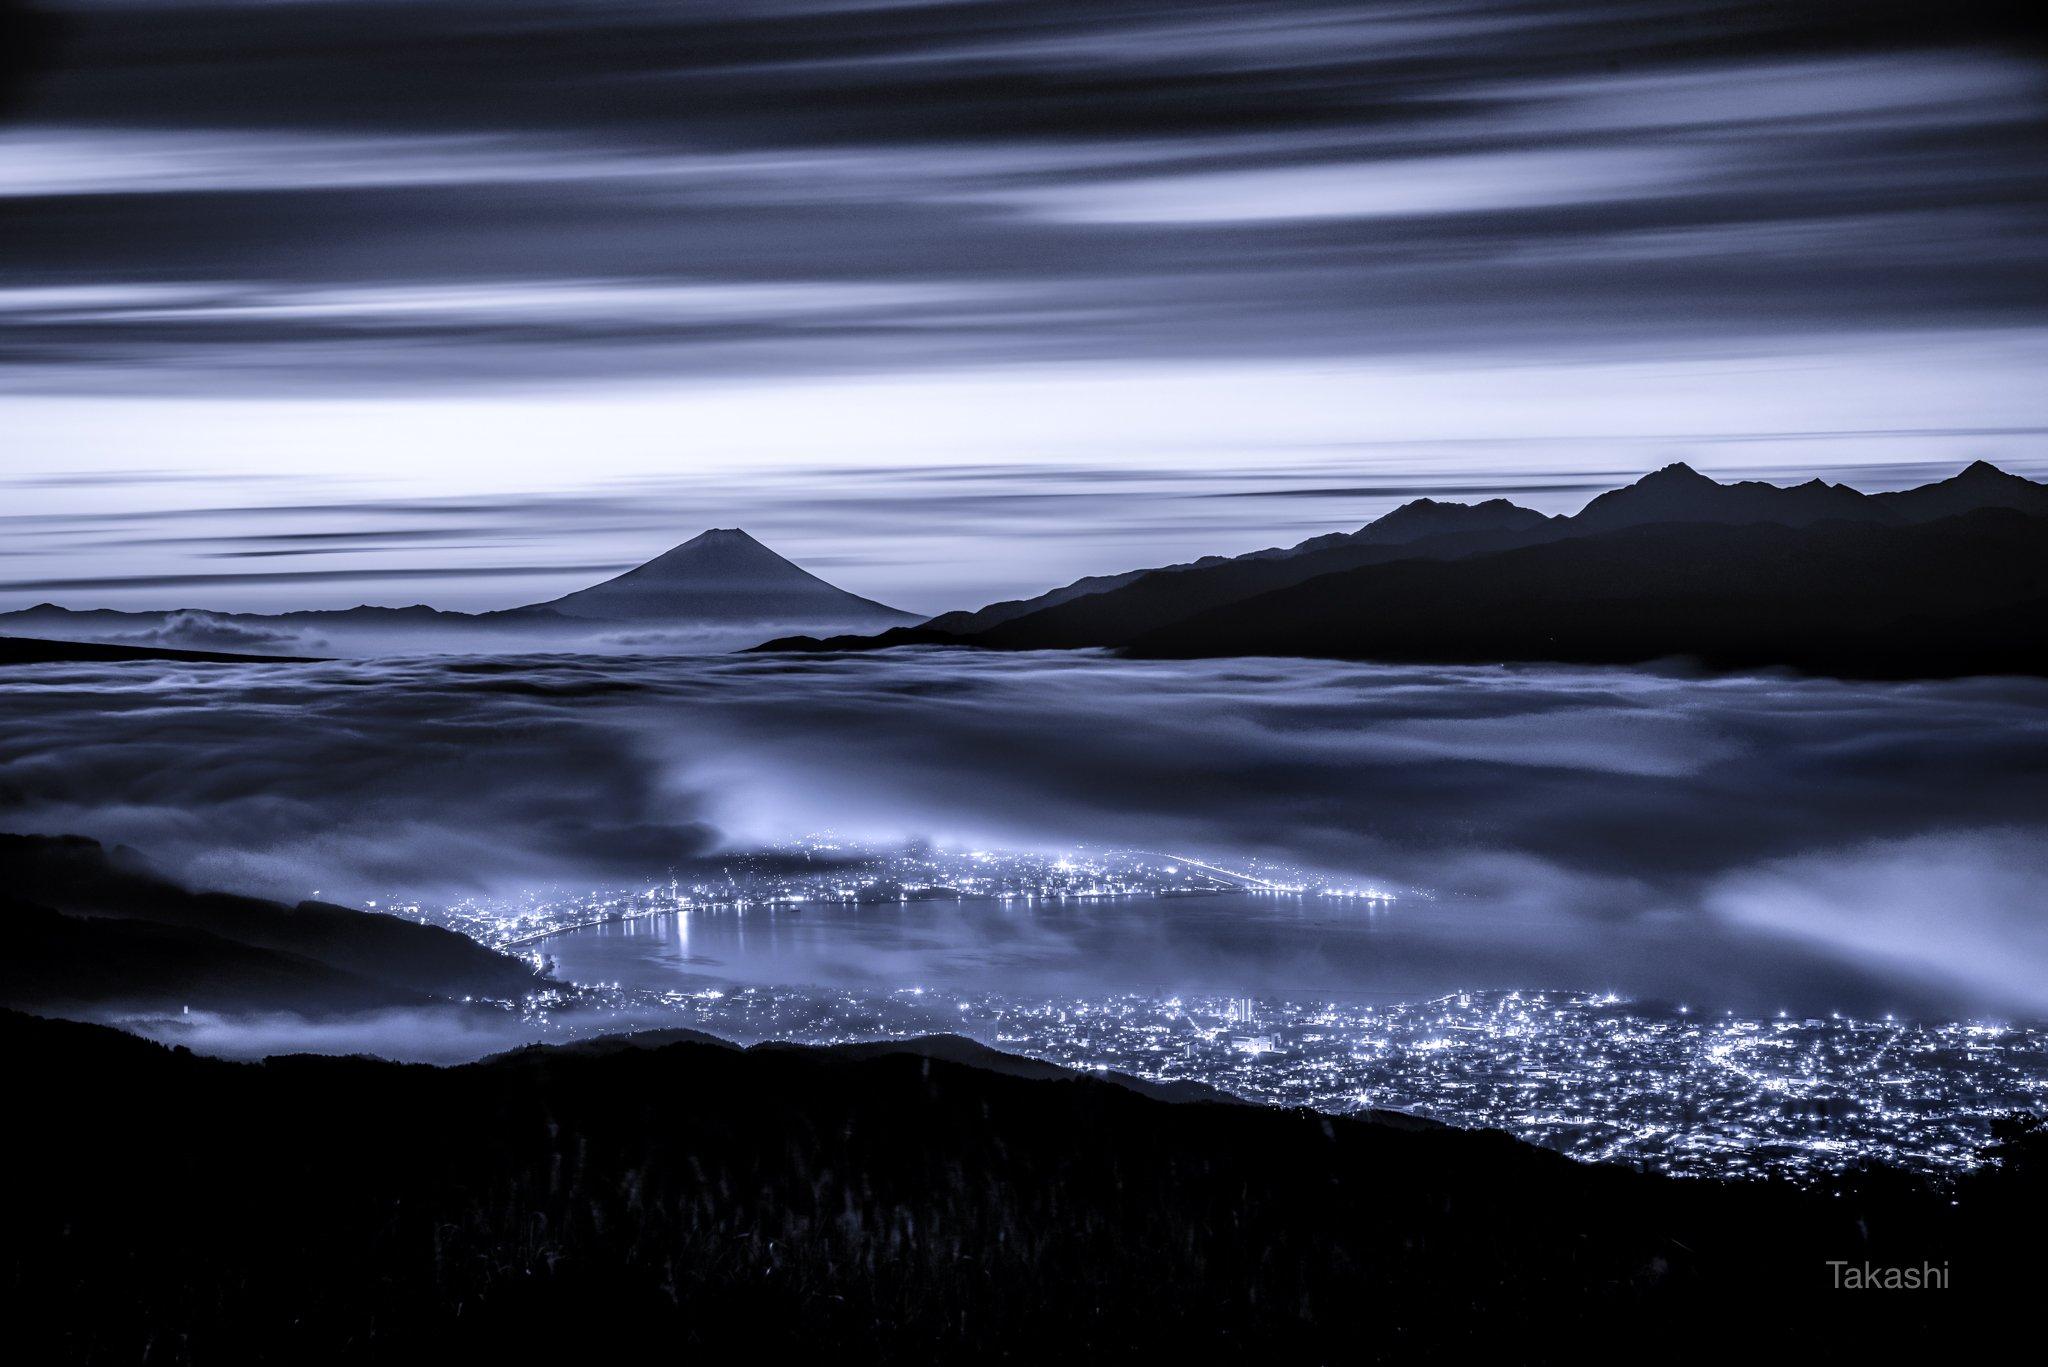 fuji,japan,mountain,clouds,sky,lake,night,wonderful,amazing,, Takashi